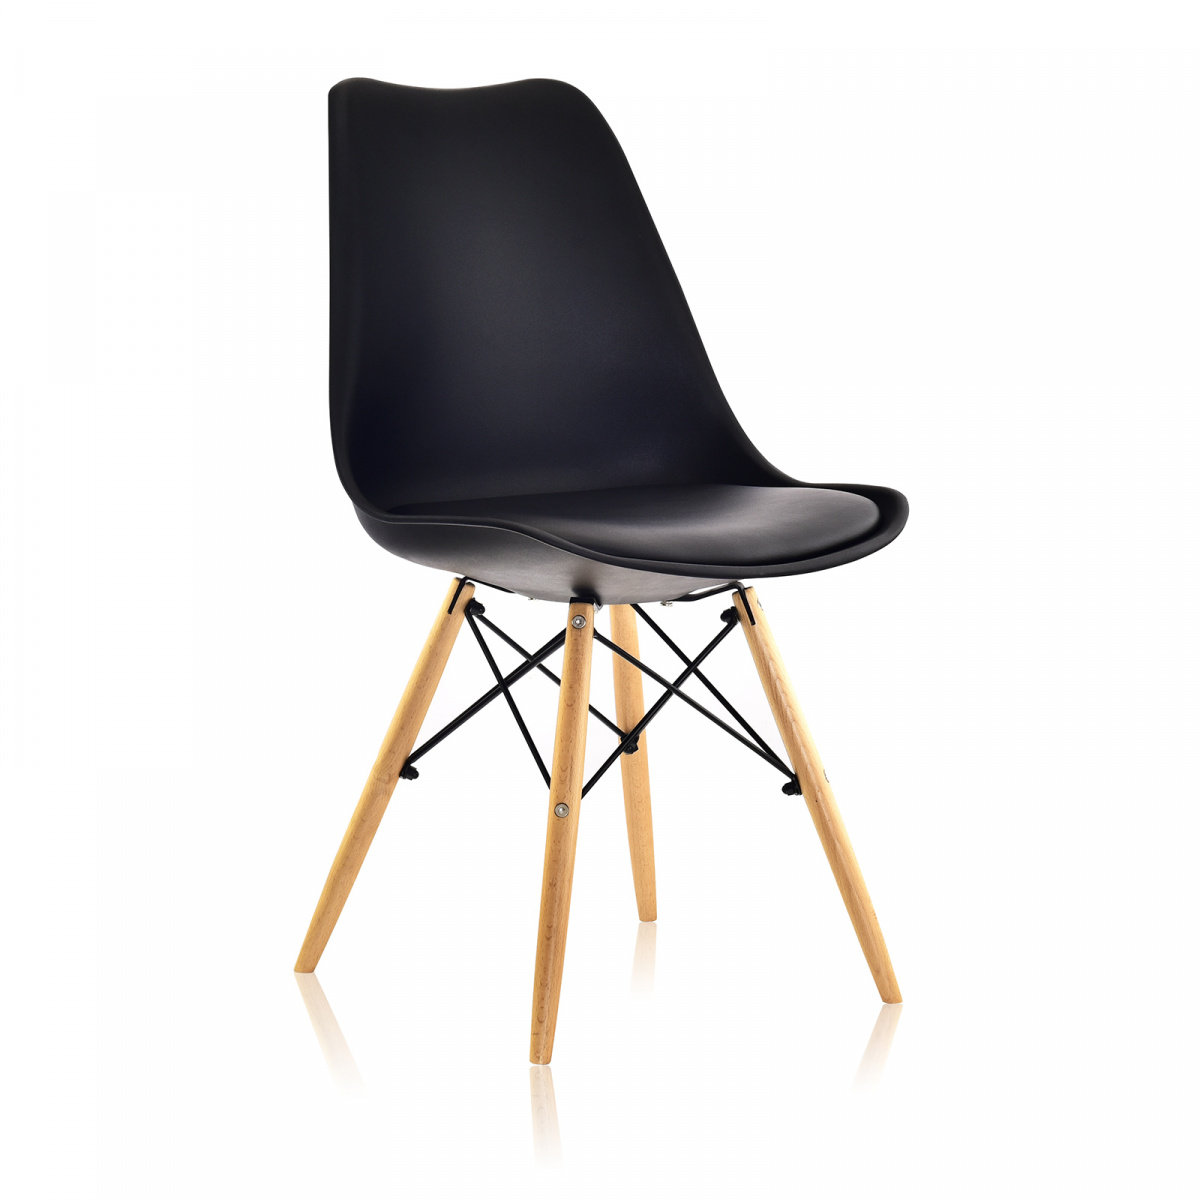 Стул Eames Style Soft (Эймс Стайл Софт)